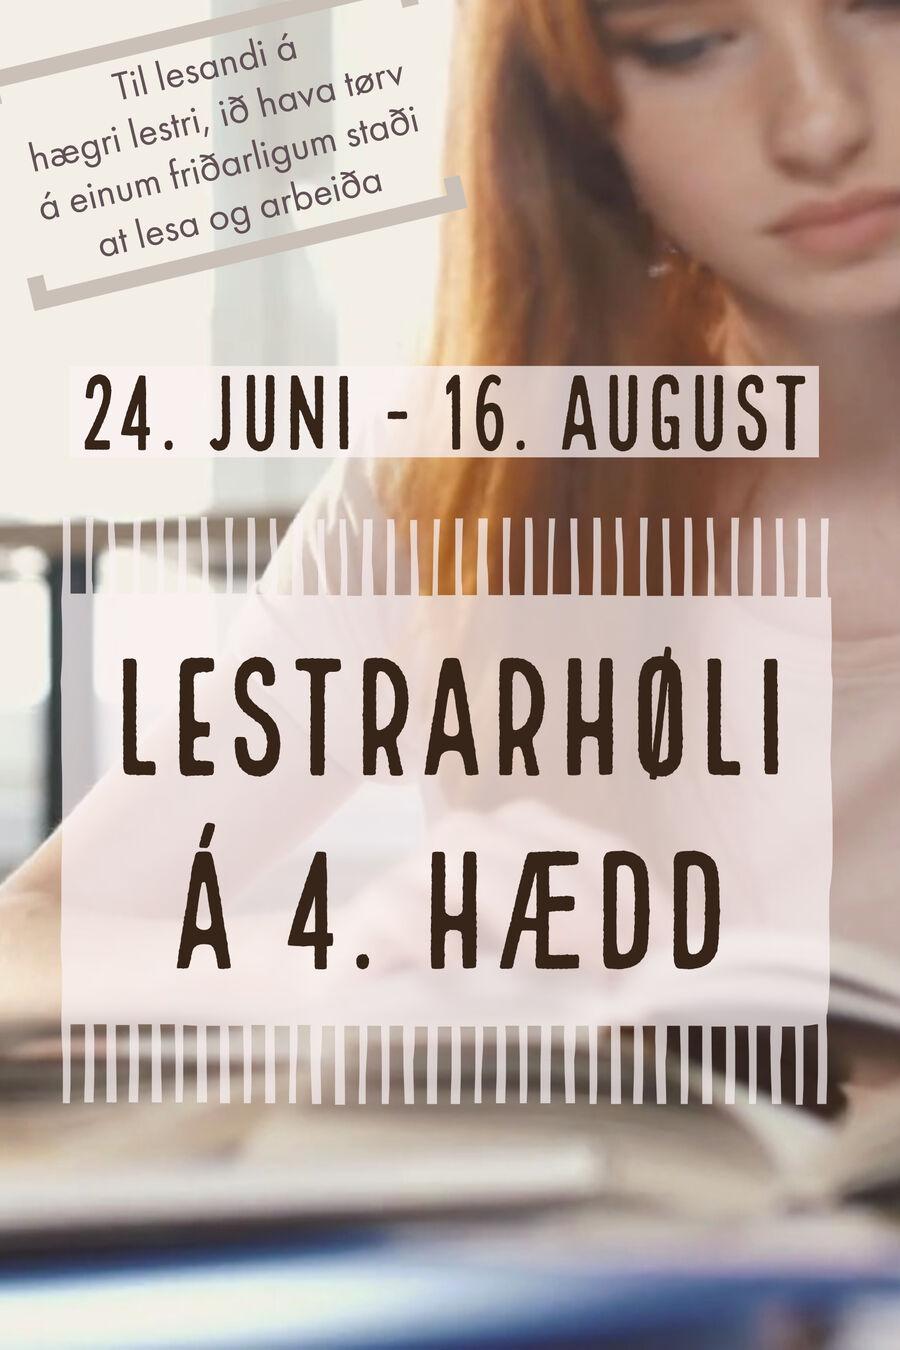 Lestrarhøli